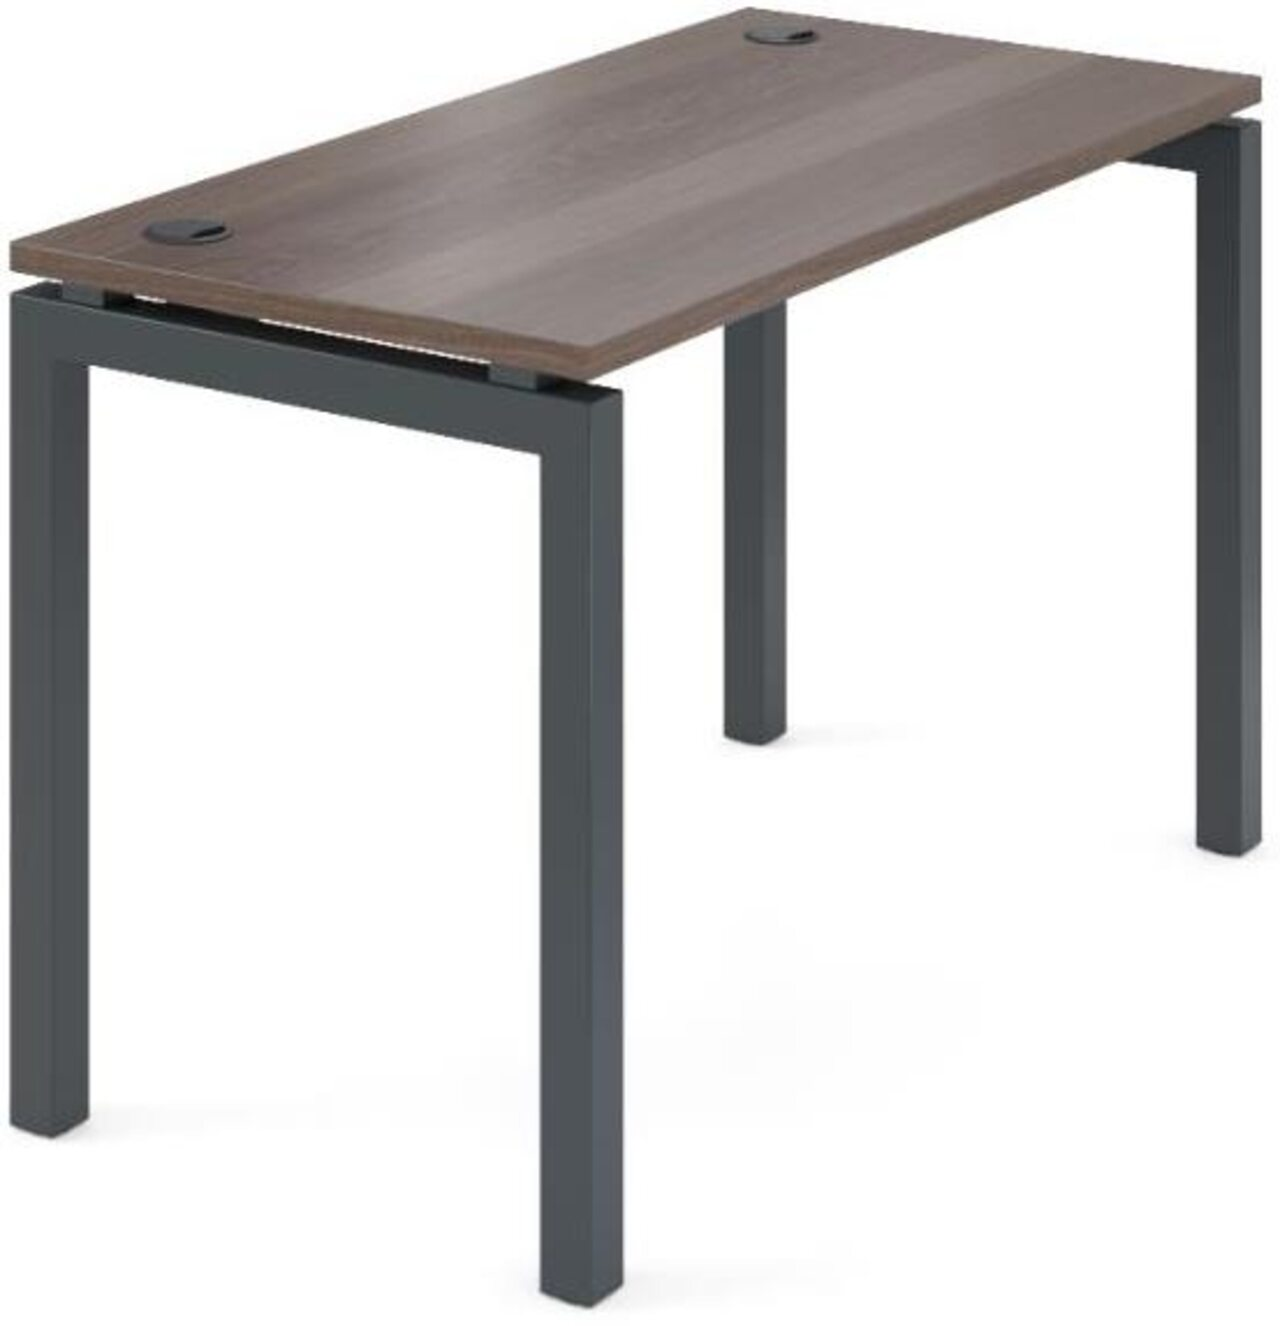 Стол на металлокаркасе  Арго 120x60x76 - фото 8